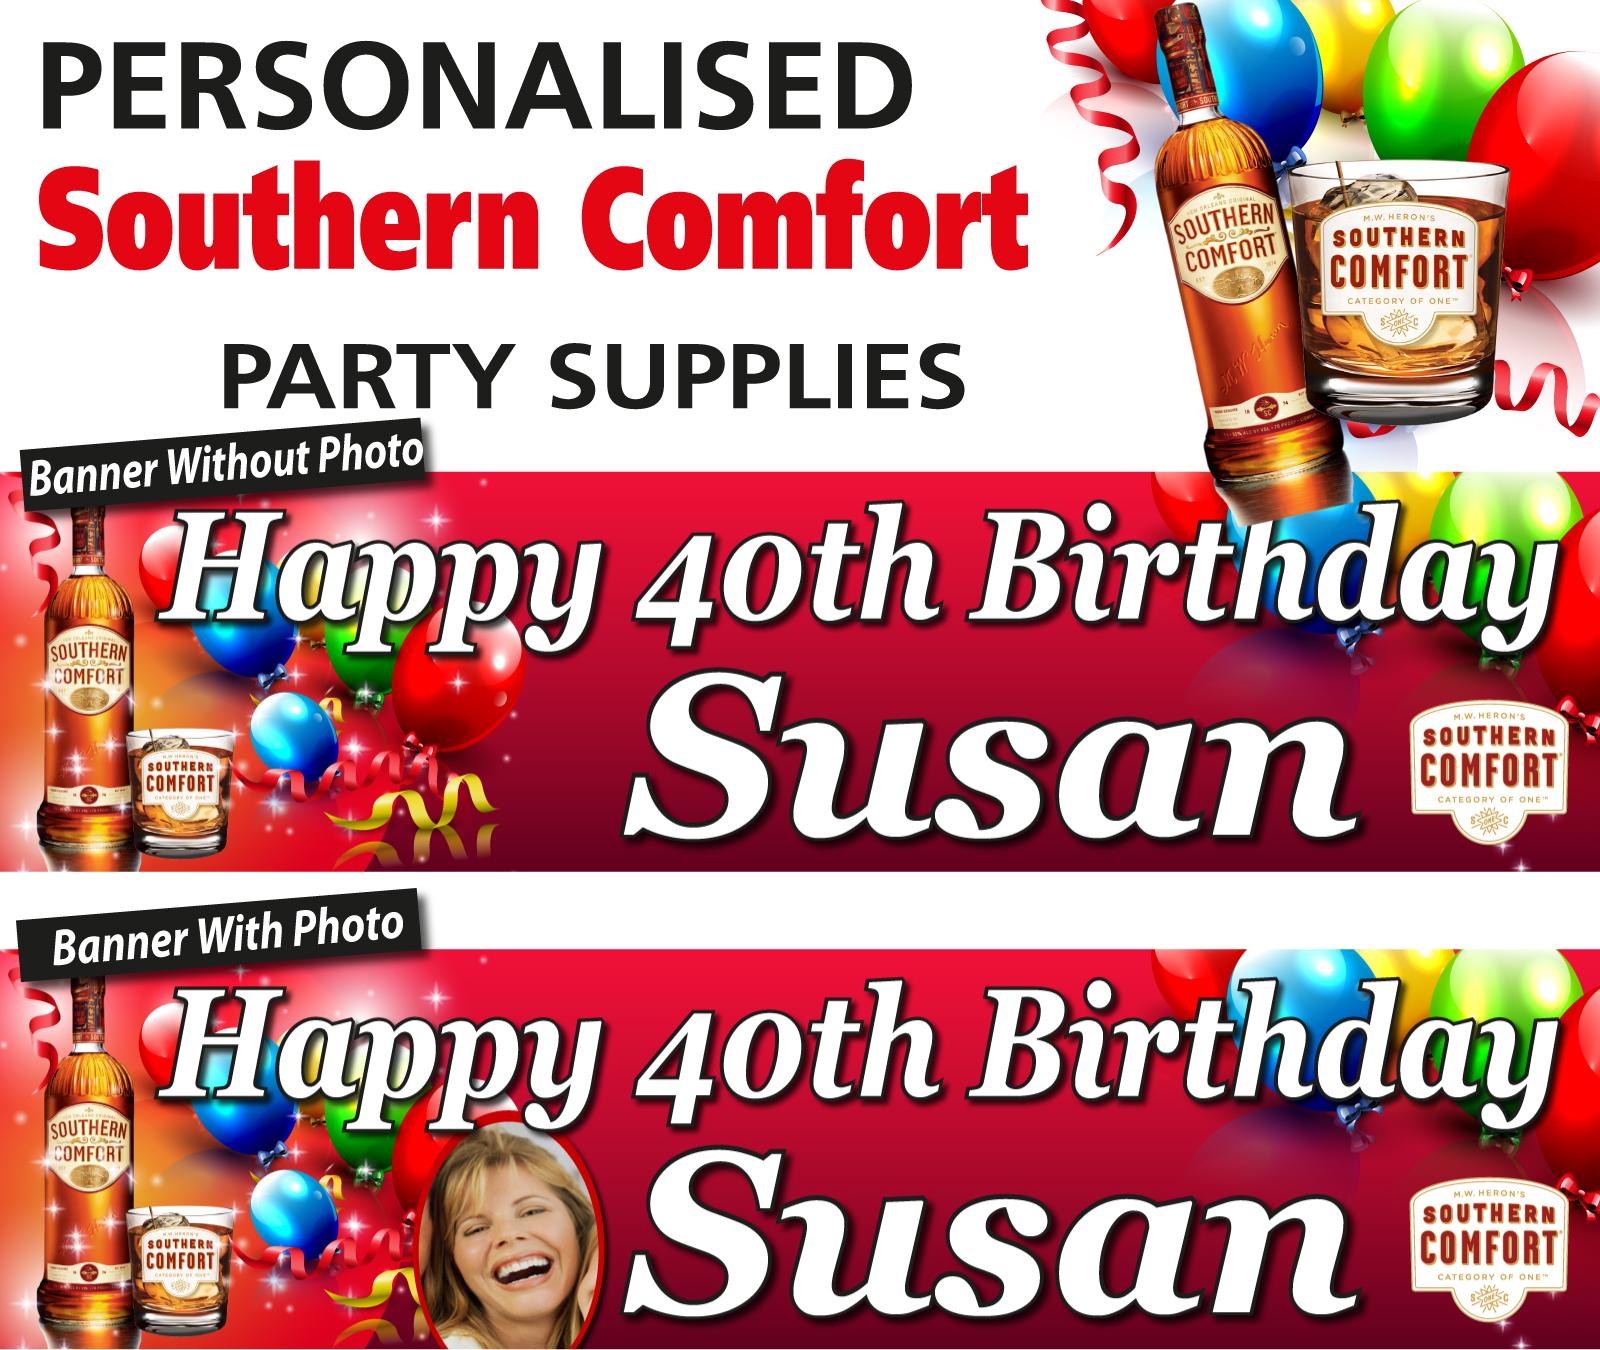 southern-comfort-banner-ebay.jpg